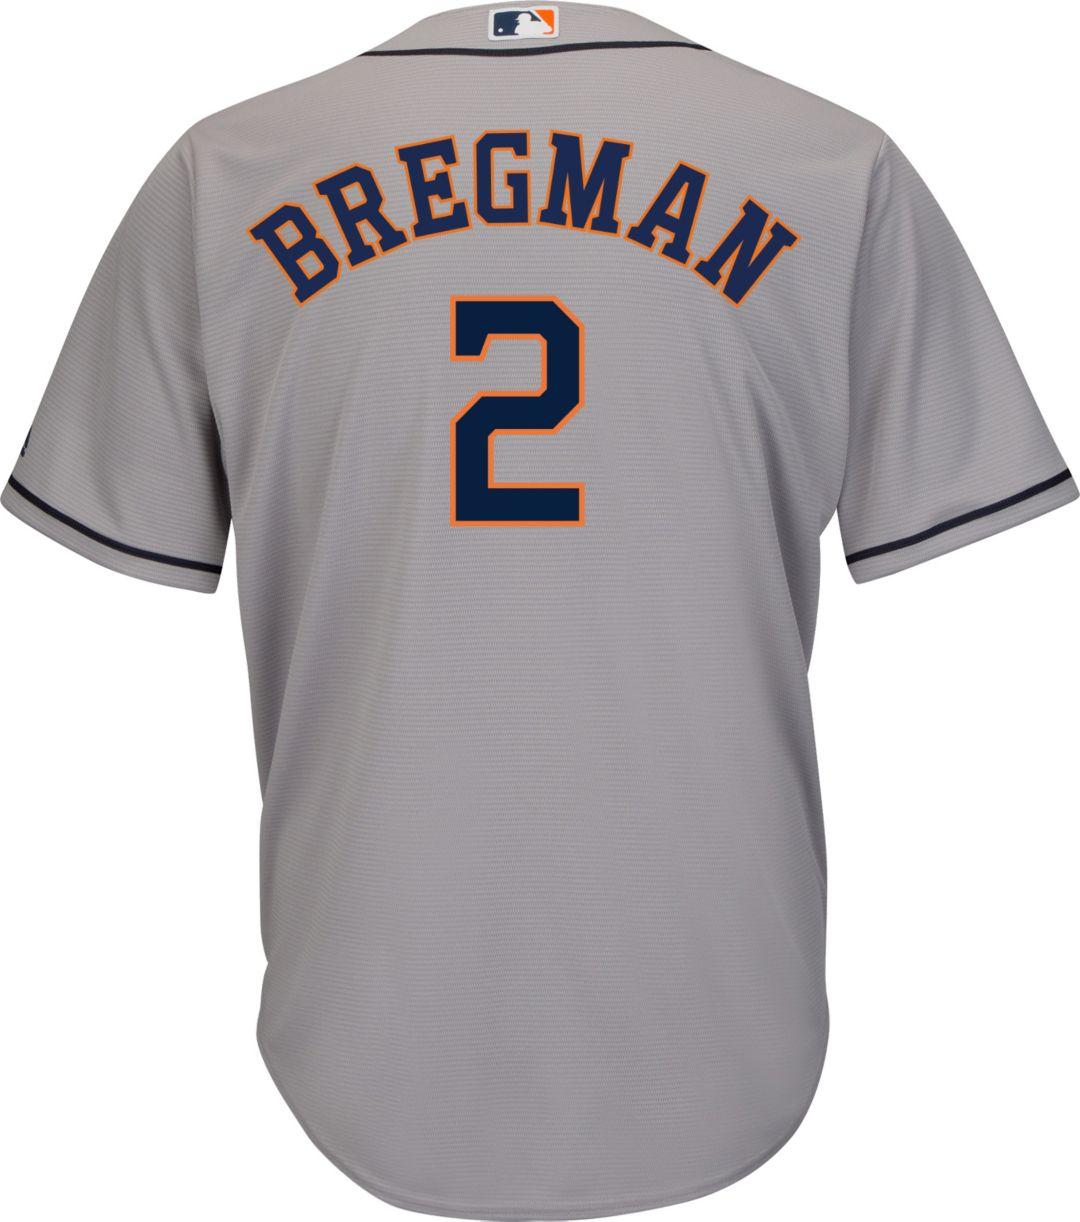 7ebf84576be Majestic Men's Replica Houston Astros Alex Bregman #2 Cool Base Road Grey  Jersey 3